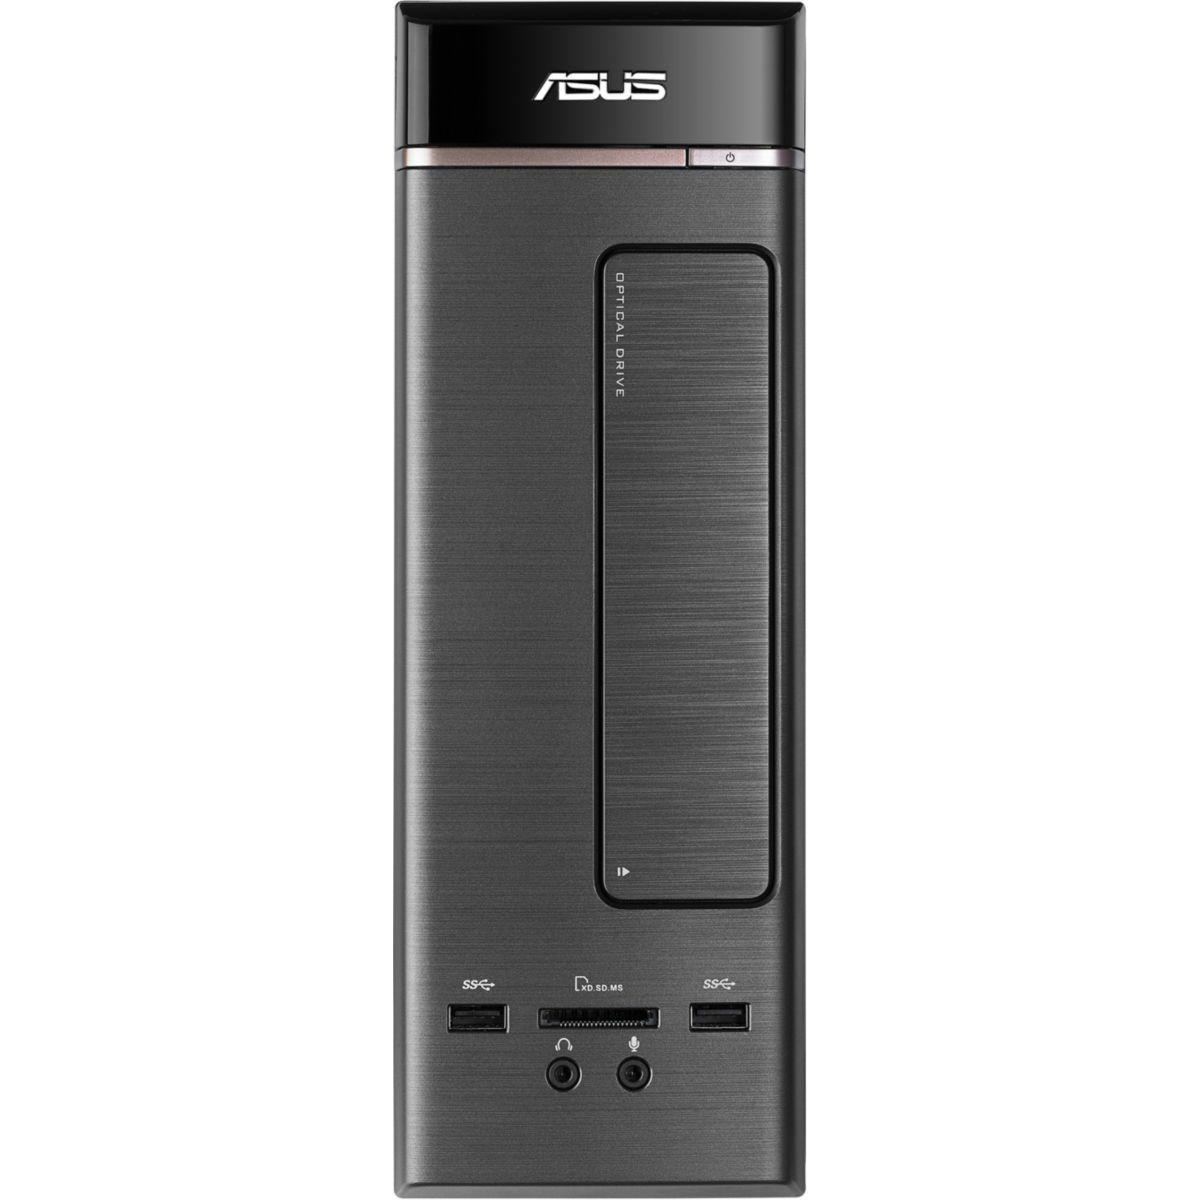 Asus F20CD-K-FR004T Core I5-7400 3 GHz - SSD 128 GB + HDD 1 TB RAM 8 GB